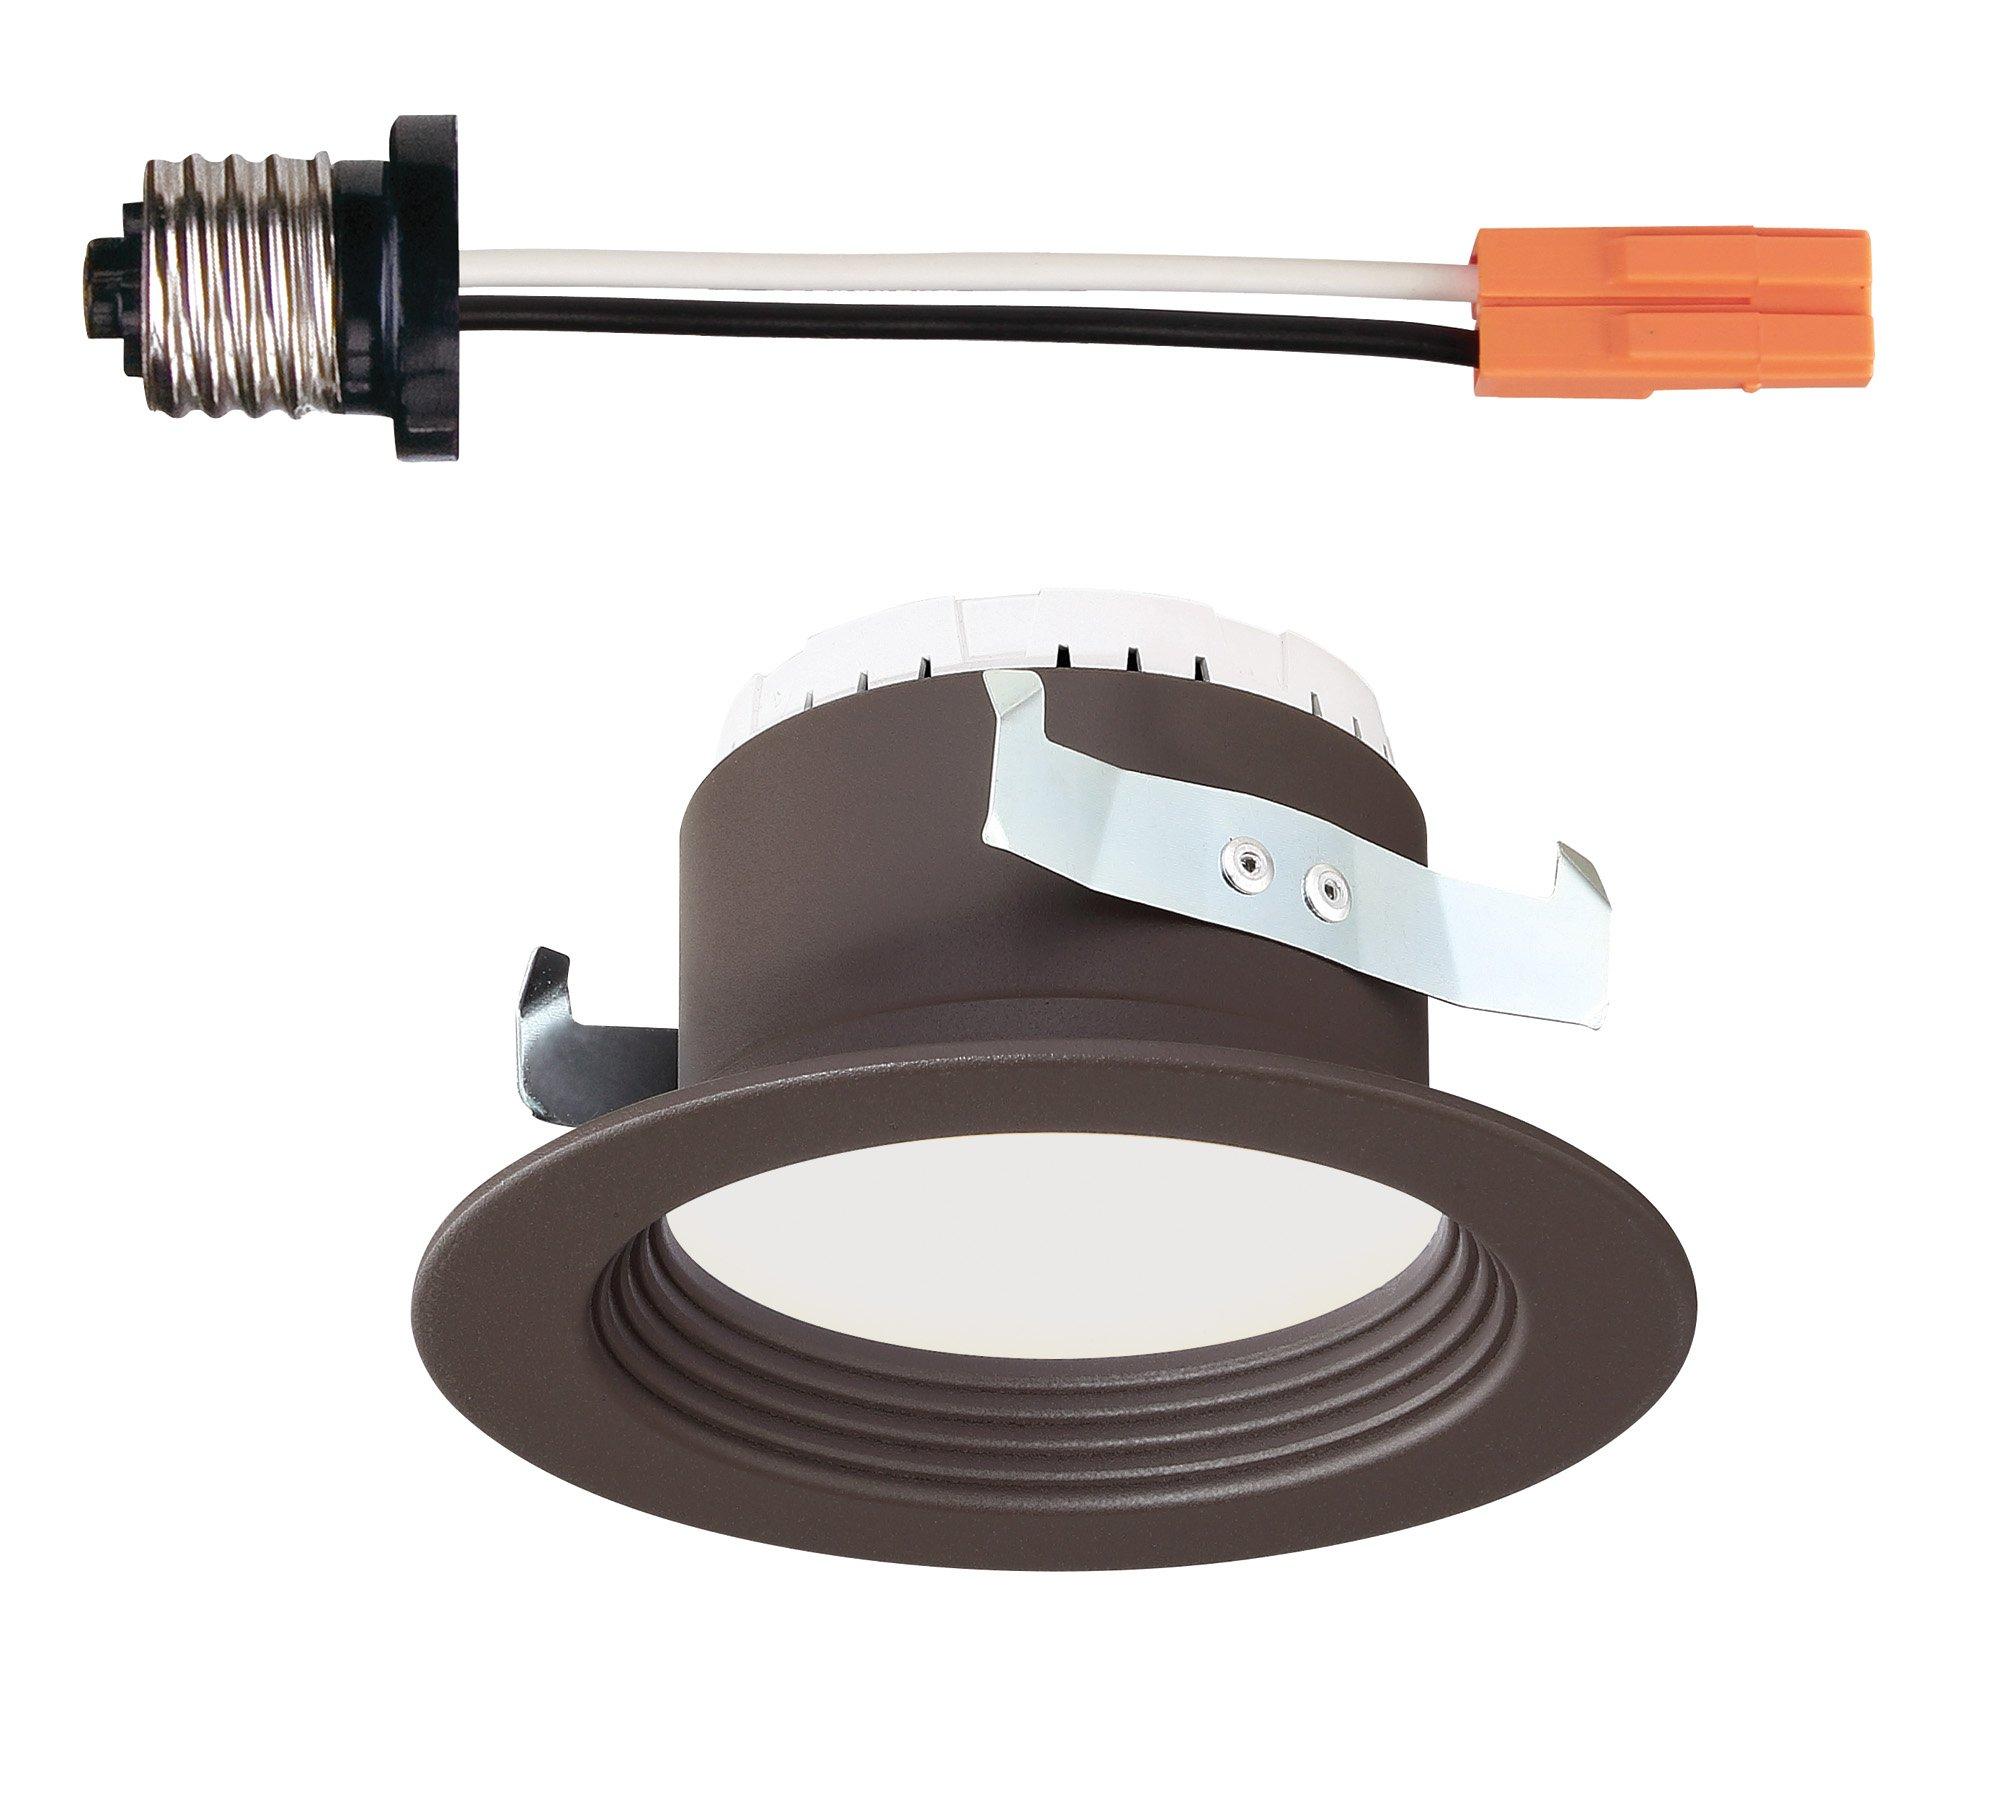 Designers Fountain EVL4733NBZ30 Trim Integrated LED Recessed Ceiling Light, 3000K, 90 Cri, 570 Lm, 4'', Bronze